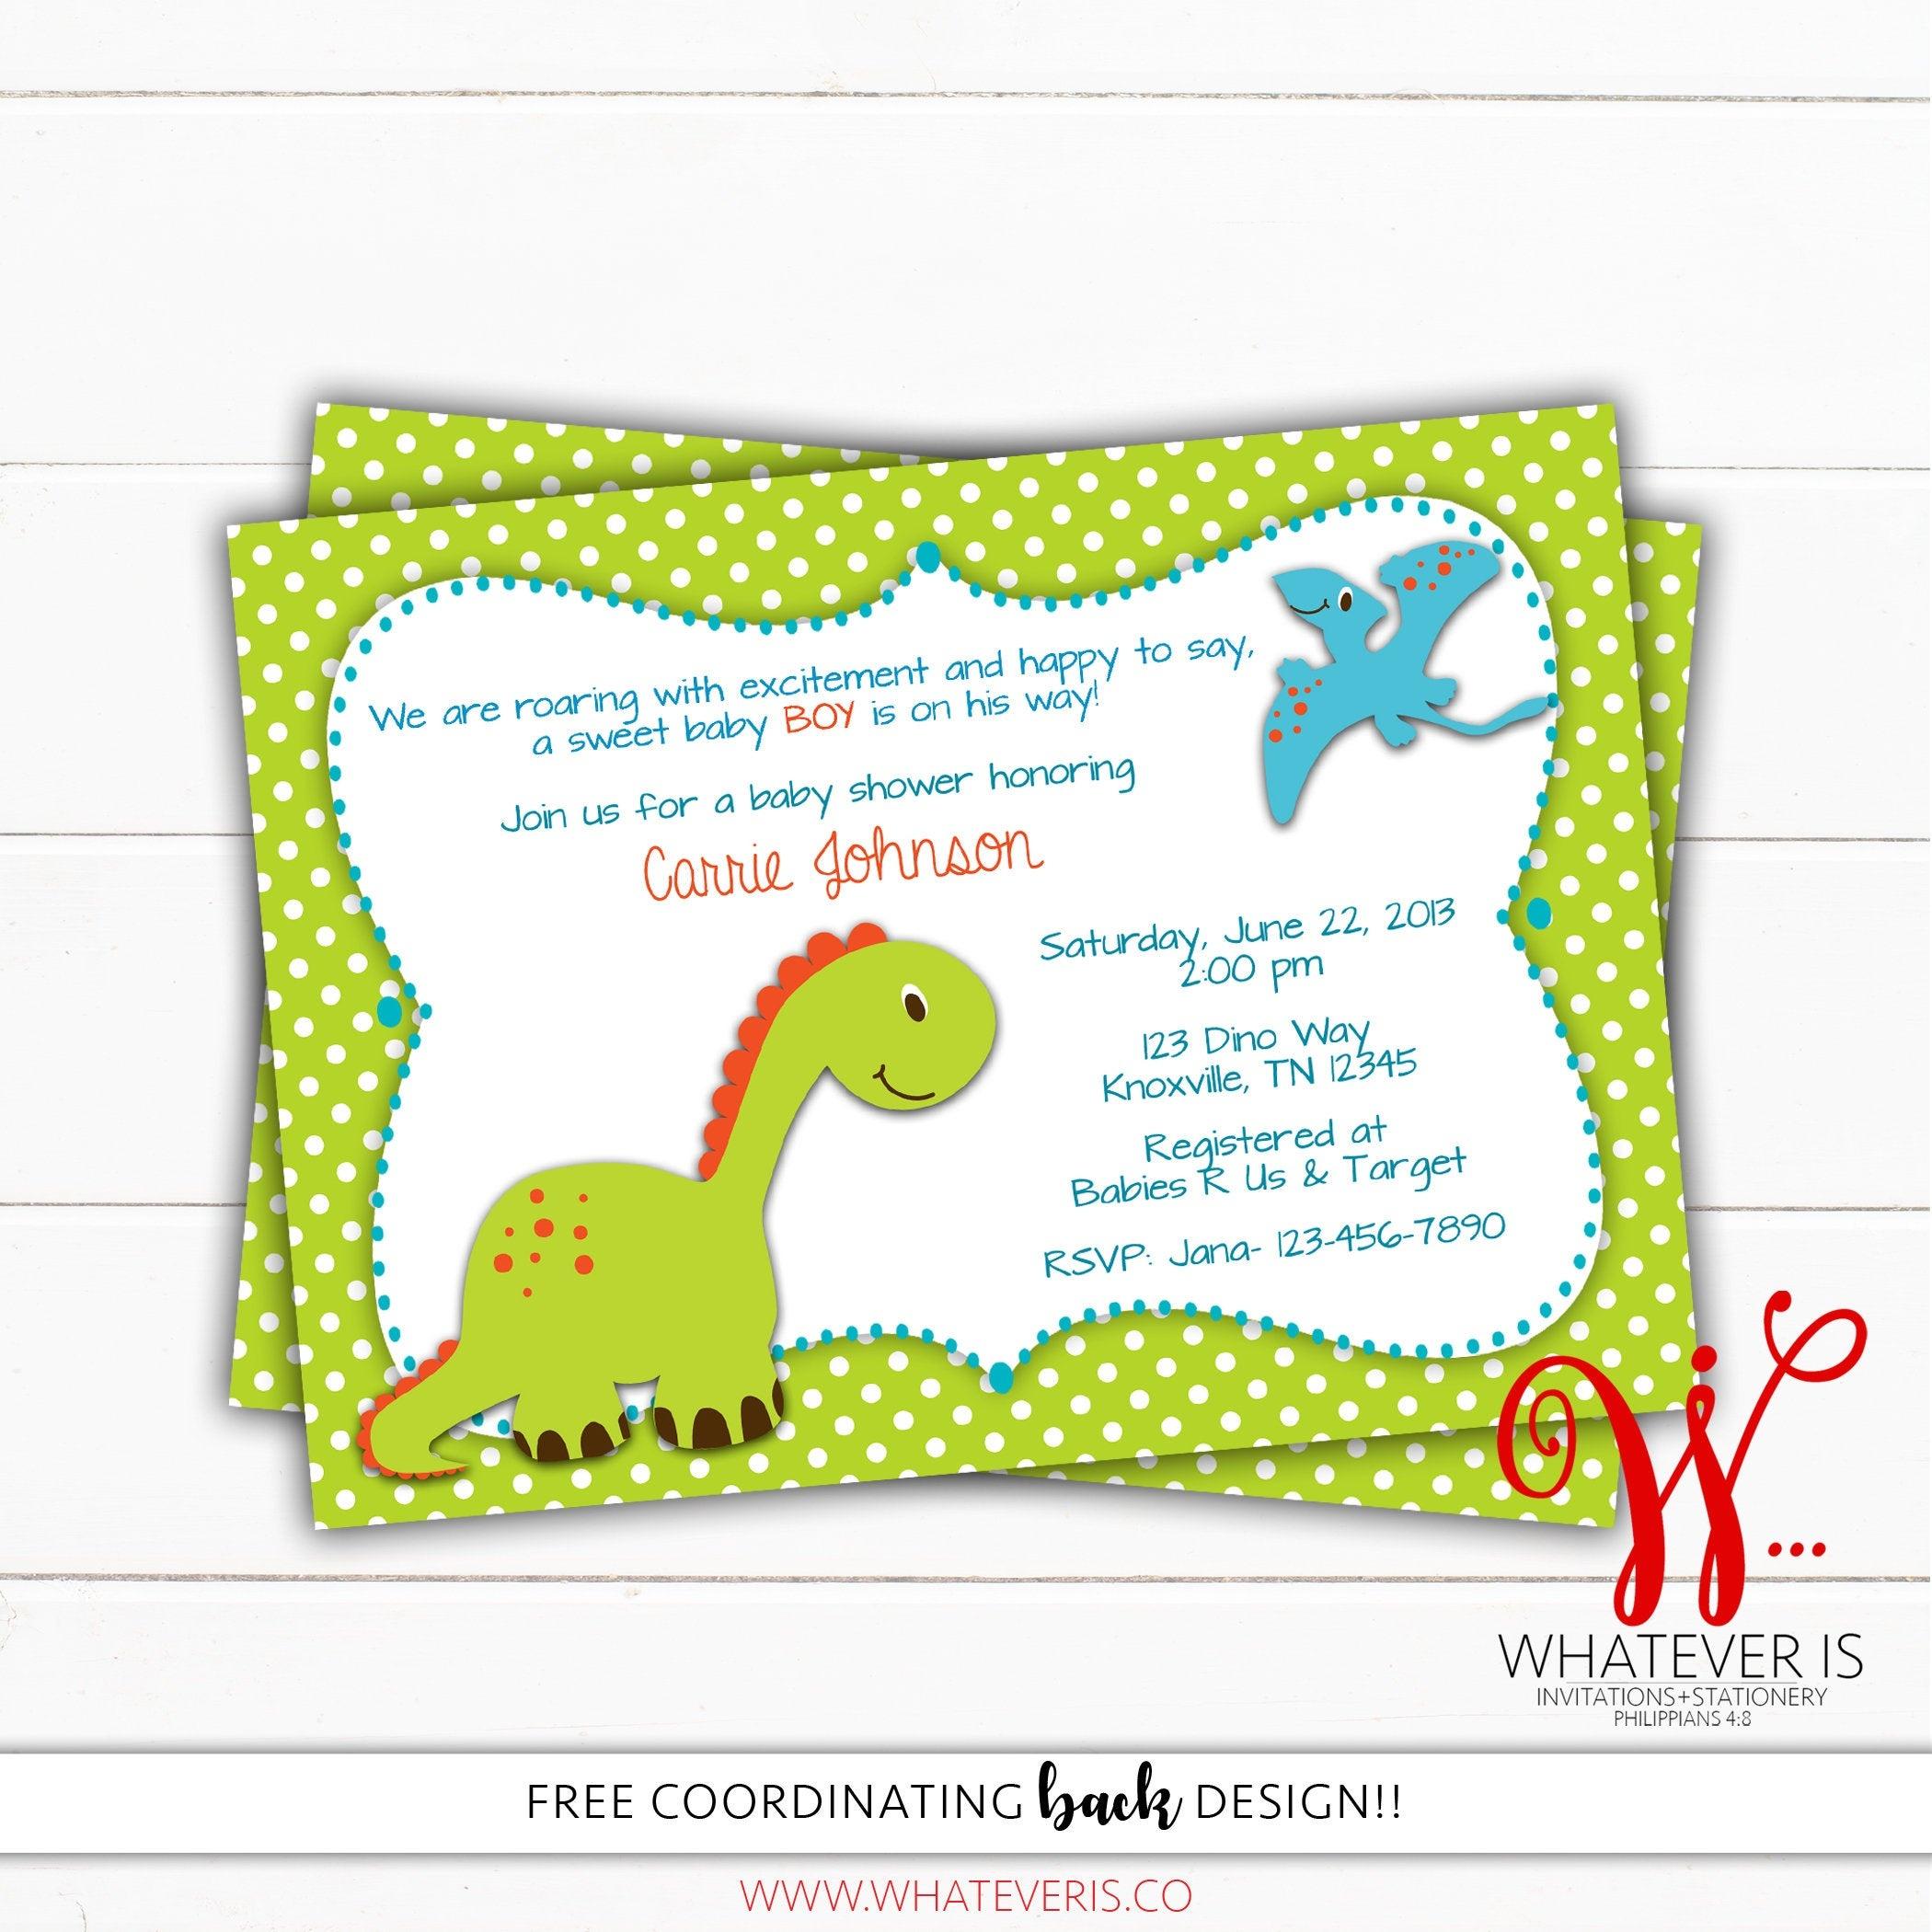 Dinosaur Baby Shower Invitation Dino Baby Shower Theme | Etsy - Free Printable Dinosaur Baby Shower Invitations